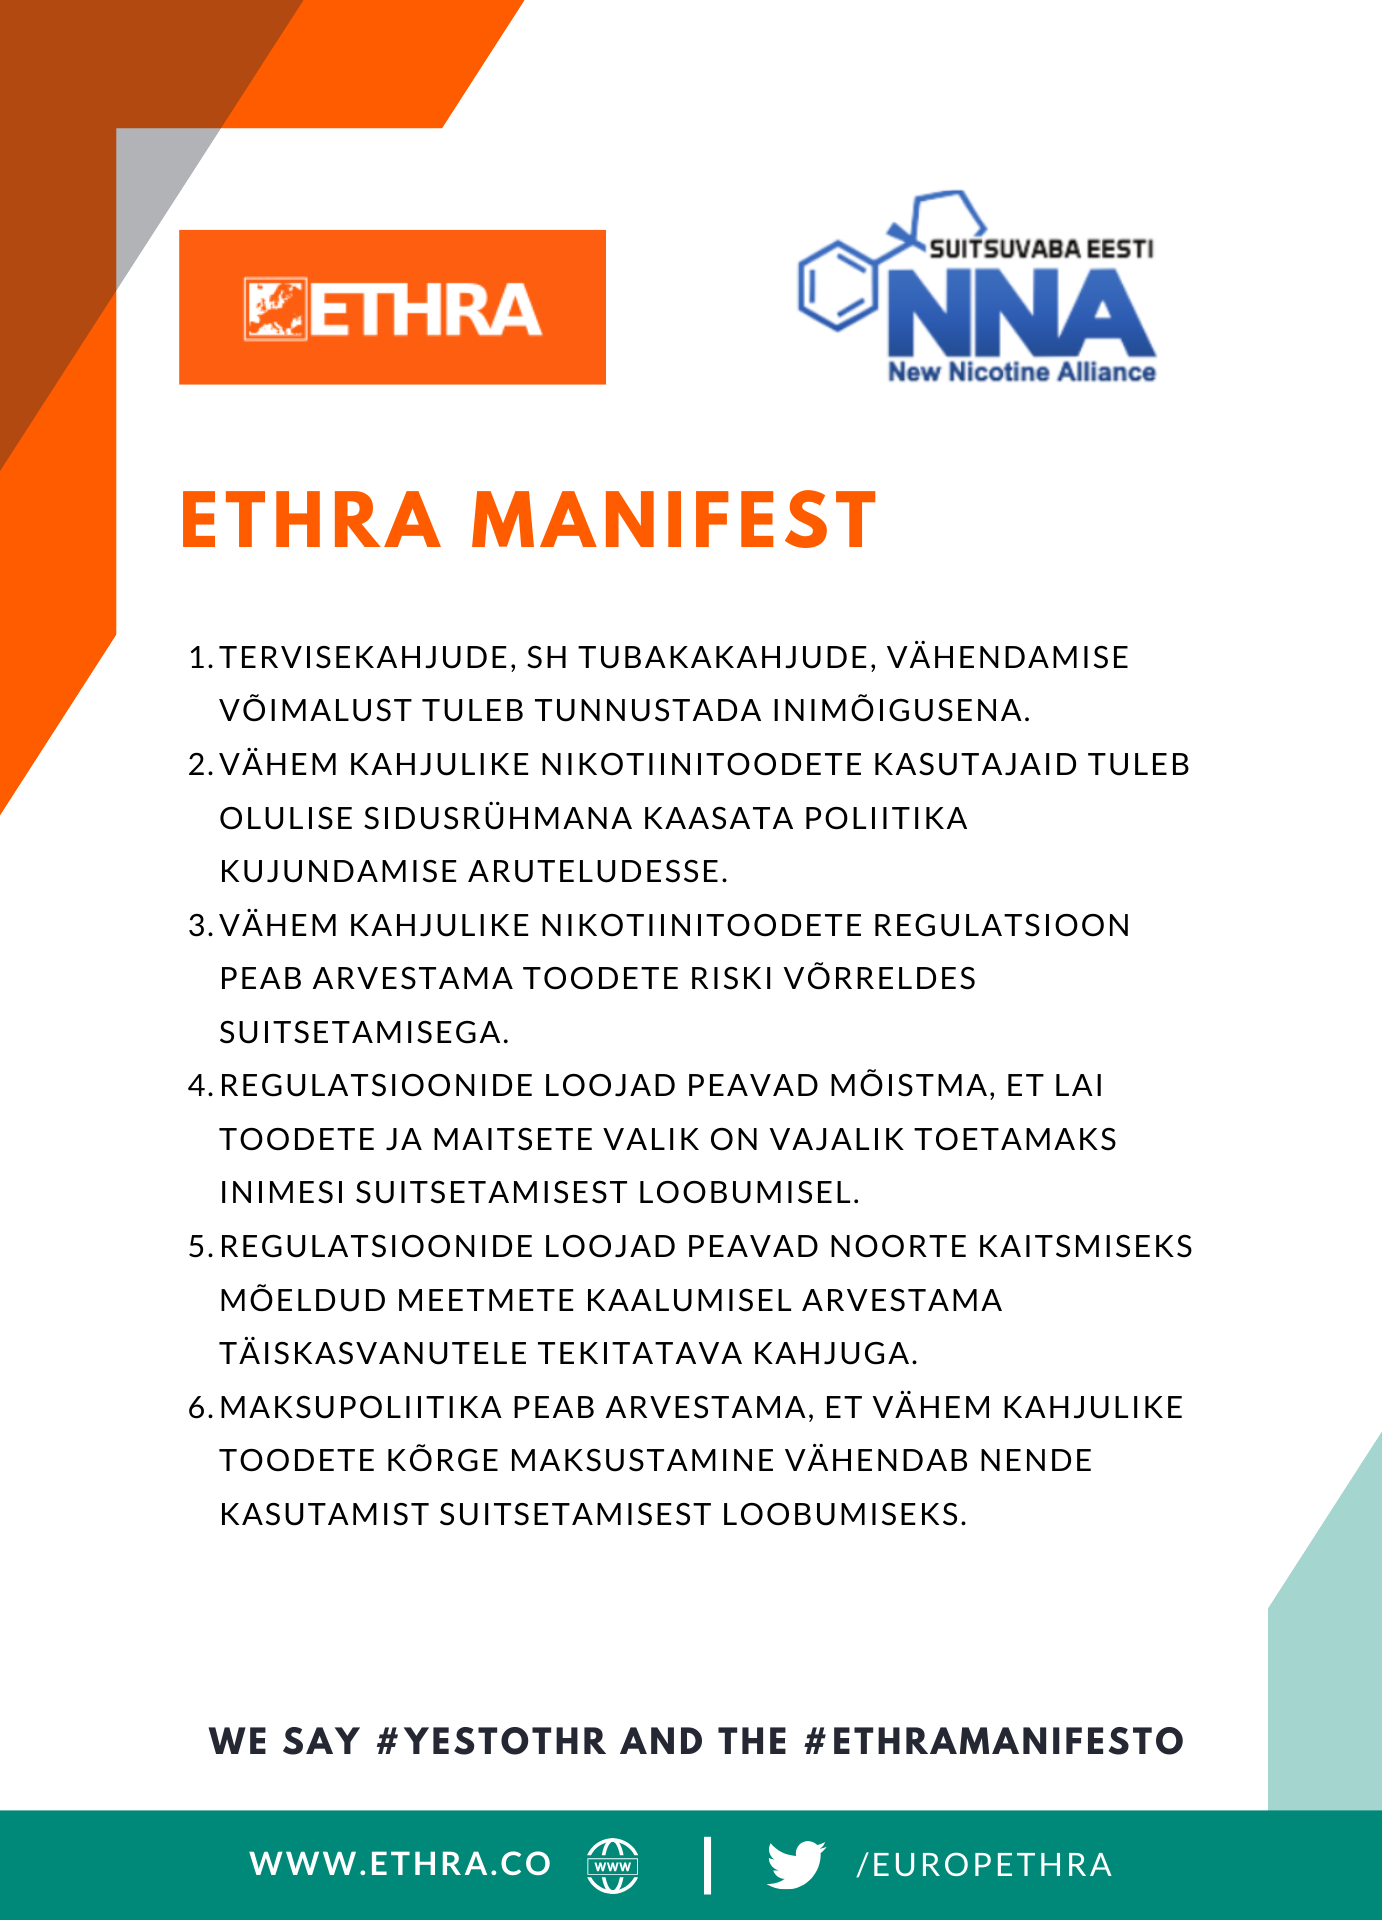 ETHRA_Manifesto_NNA_Estonia_1.png